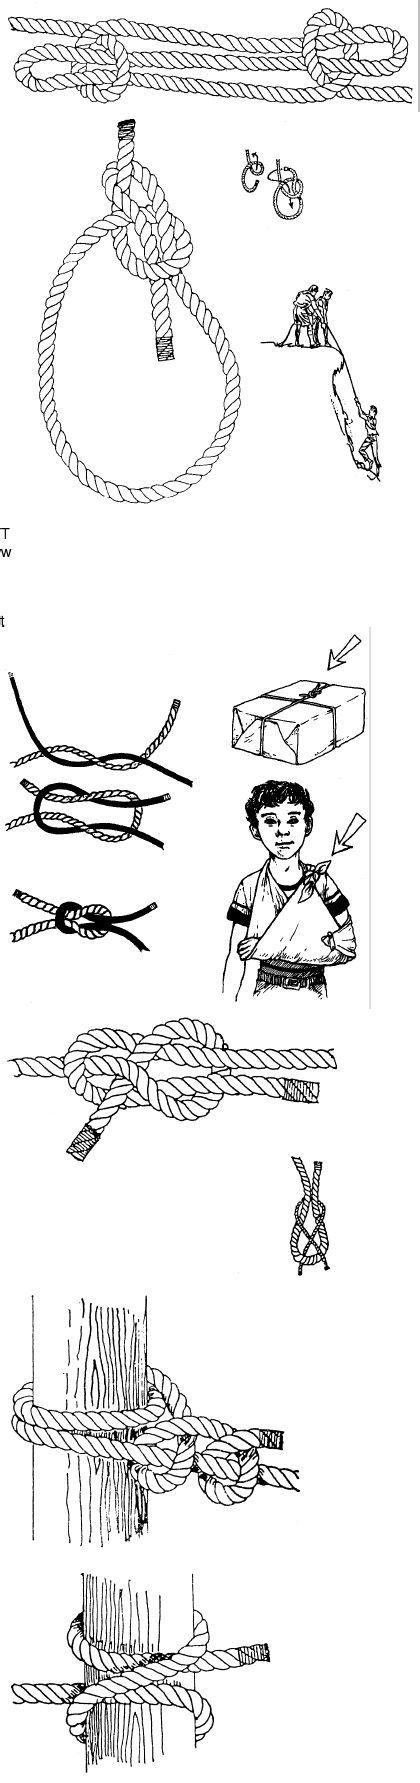 basic book of knots and lashings                                                                                                                                                                                 Más